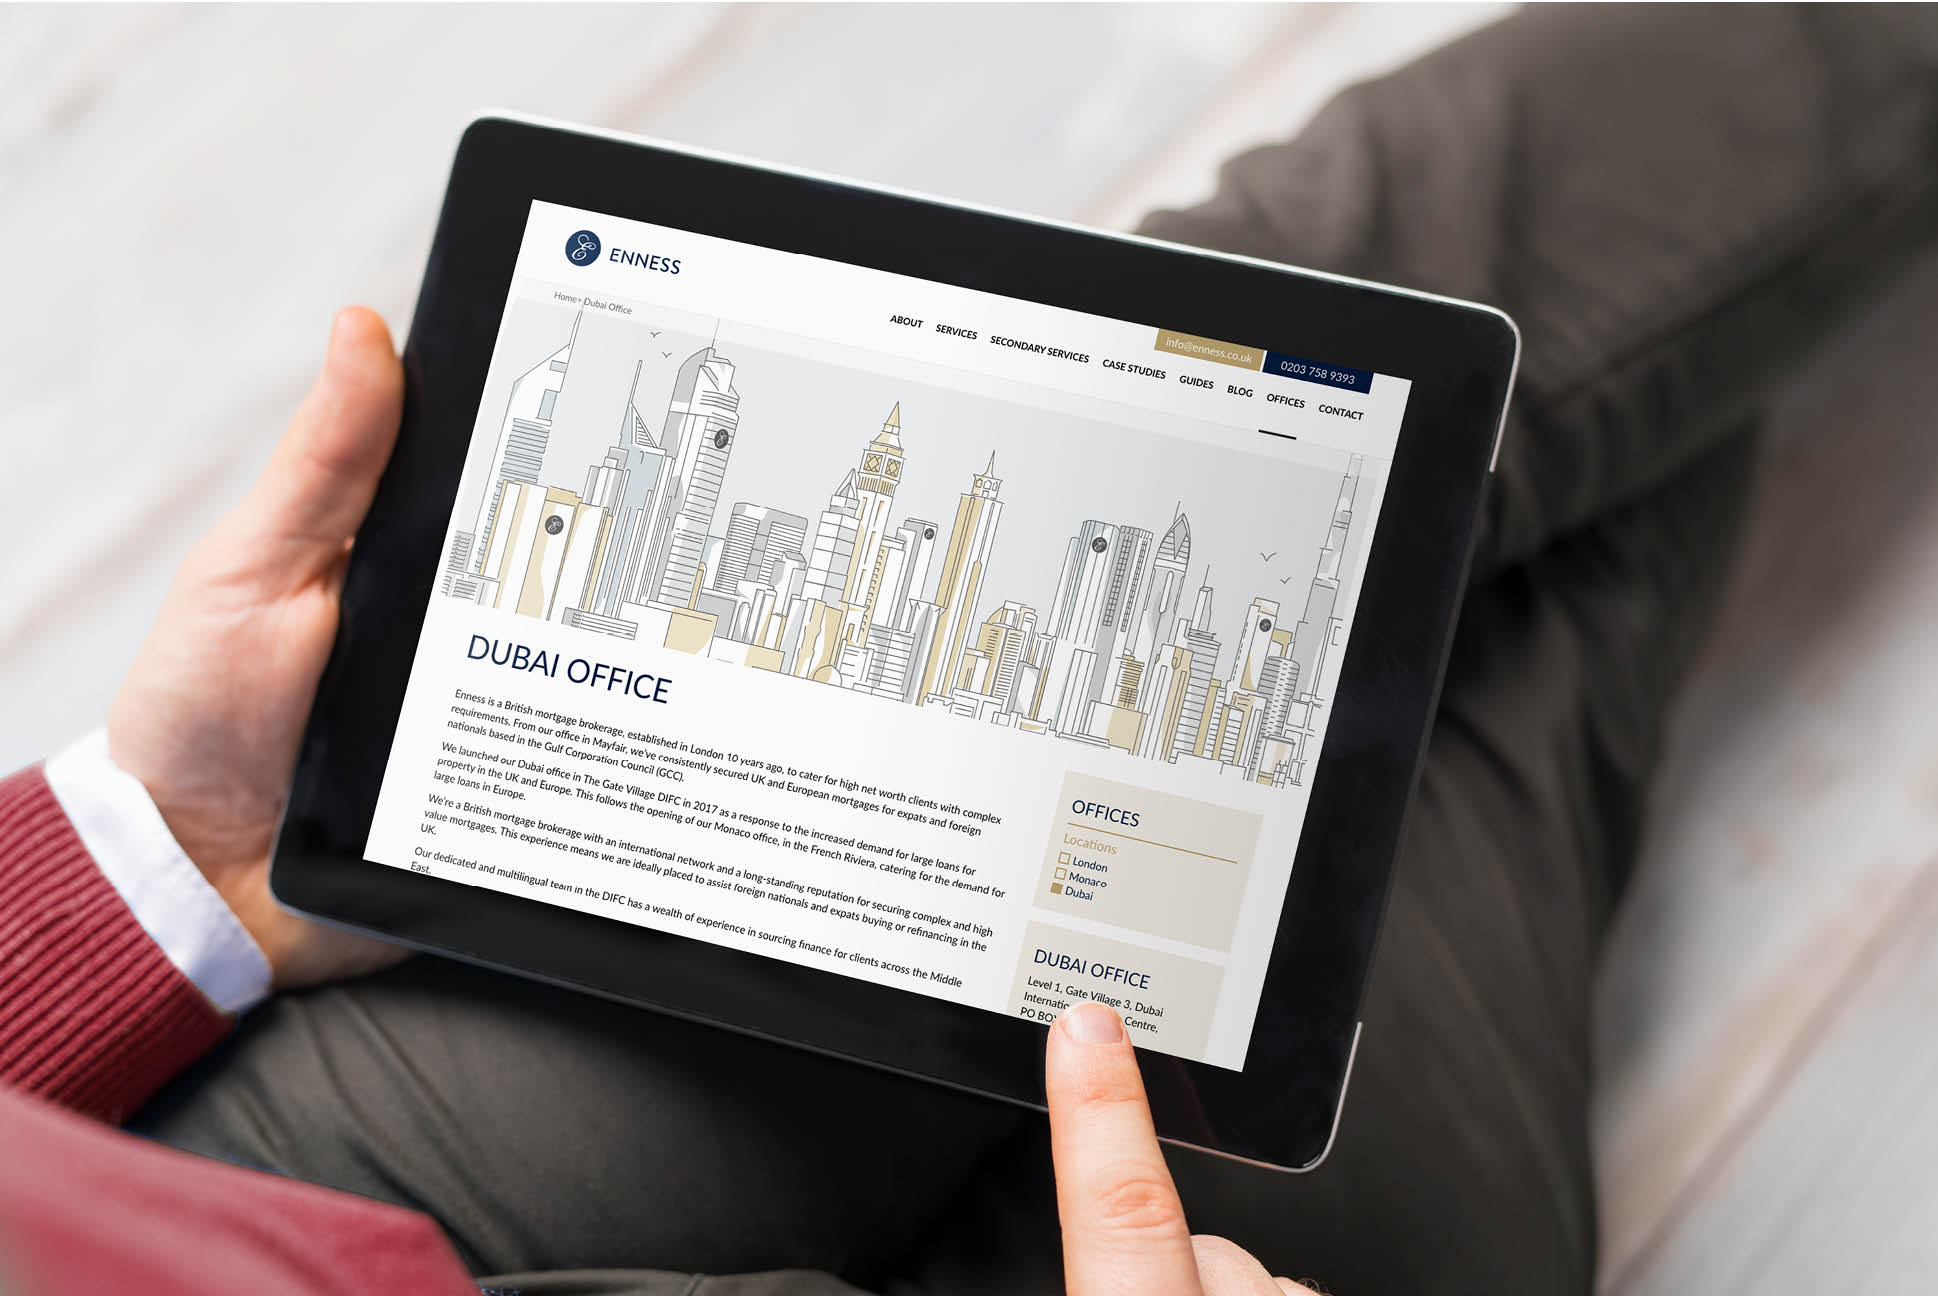 Enness Website   Independent Marketing Brand Audit and Branding Refresh Services   IM London